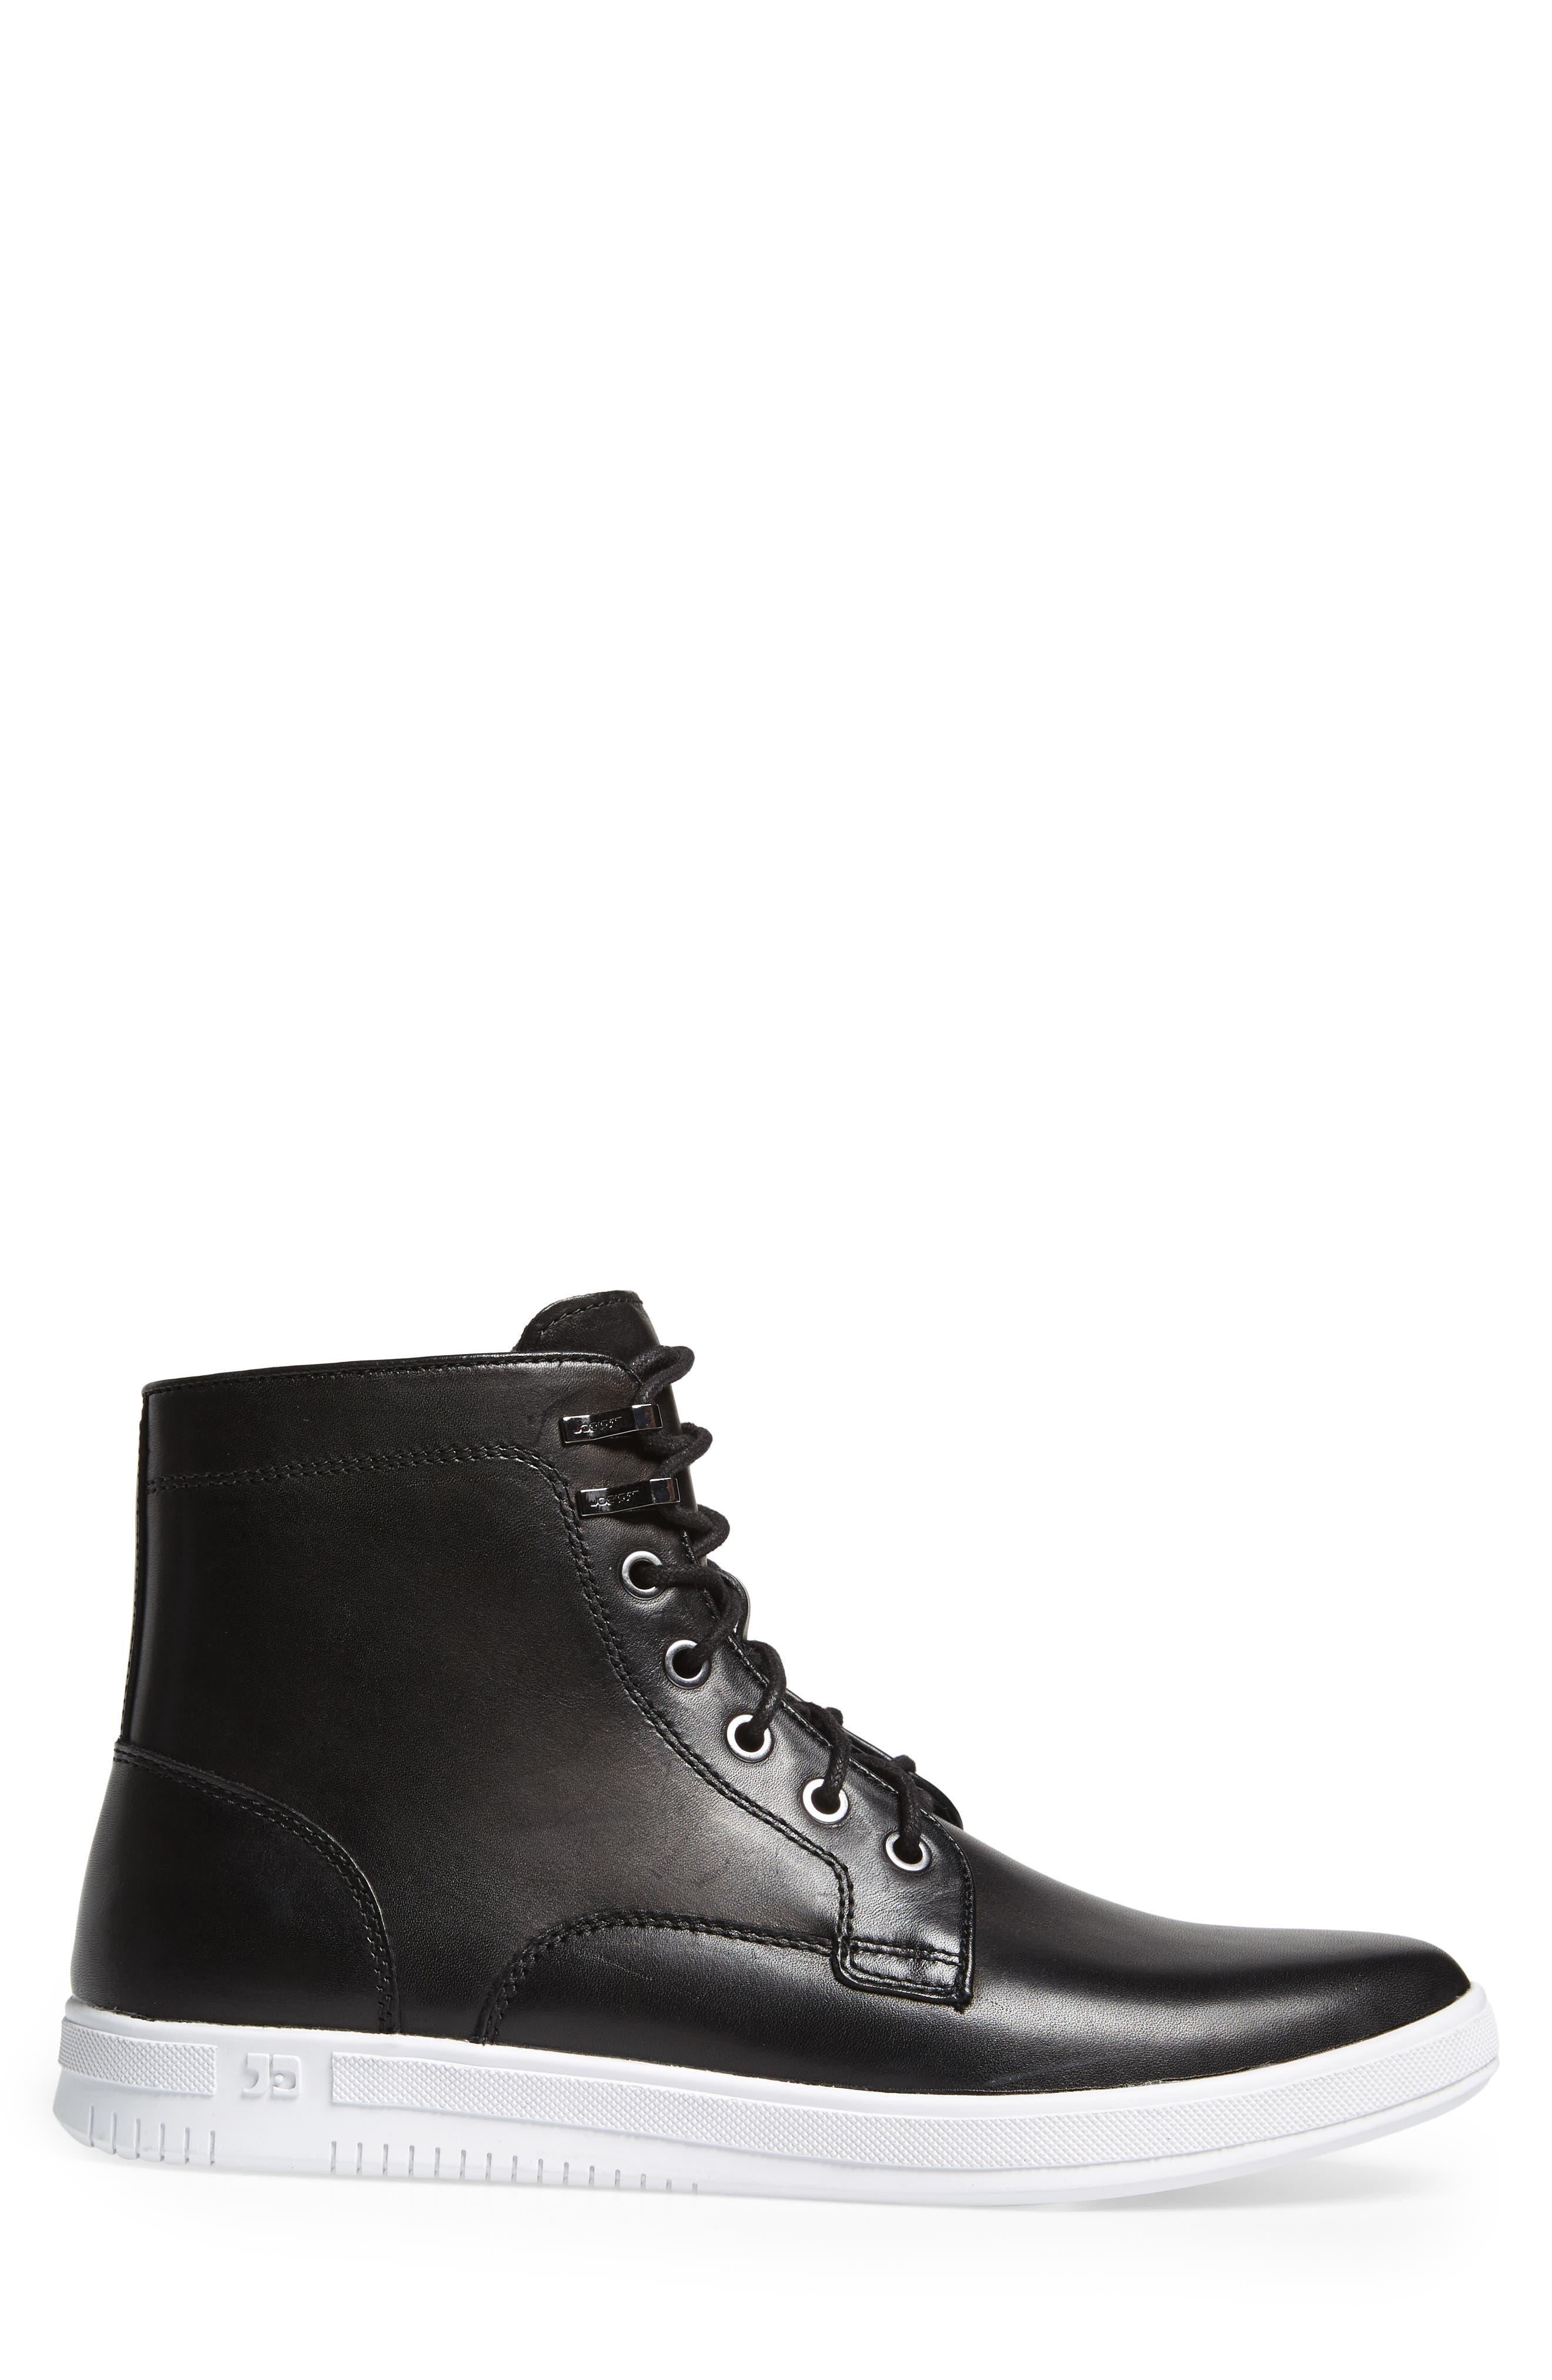 Not So Ordinary Joe Sneaker,                             Alternate thumbnail 3, color,                             001